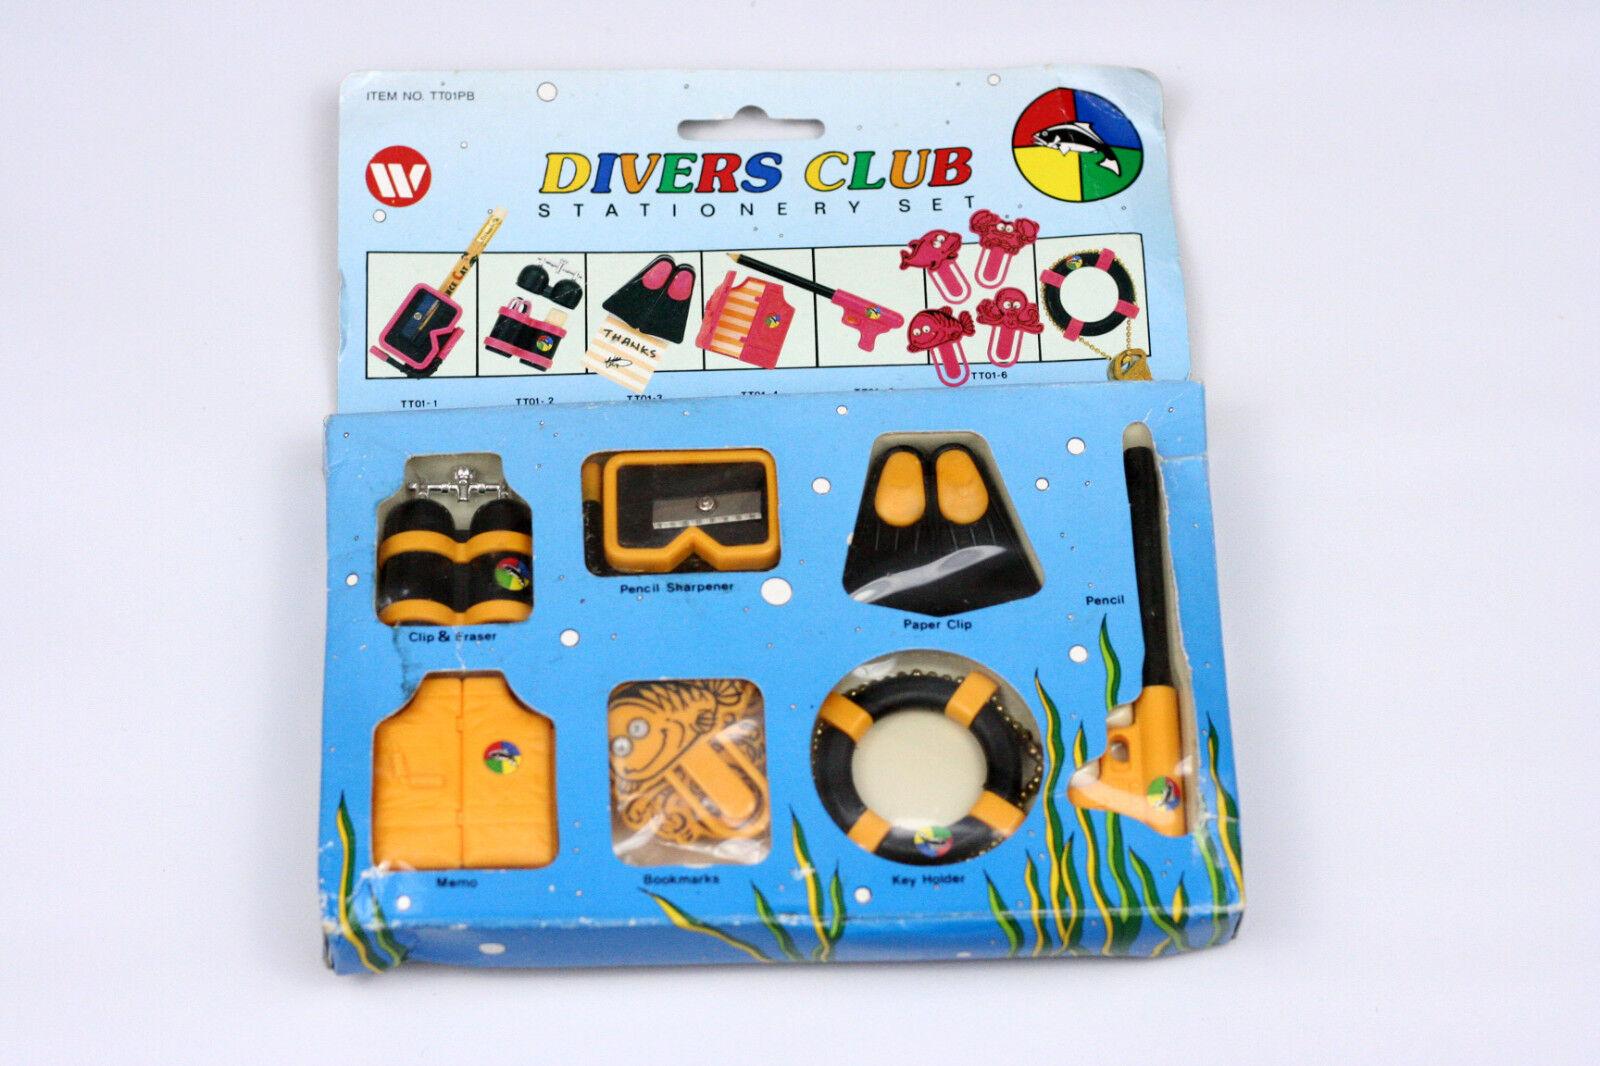 Vintage 1990 Divers Club Stationary Set Pencil Sharpener Key Holders and More